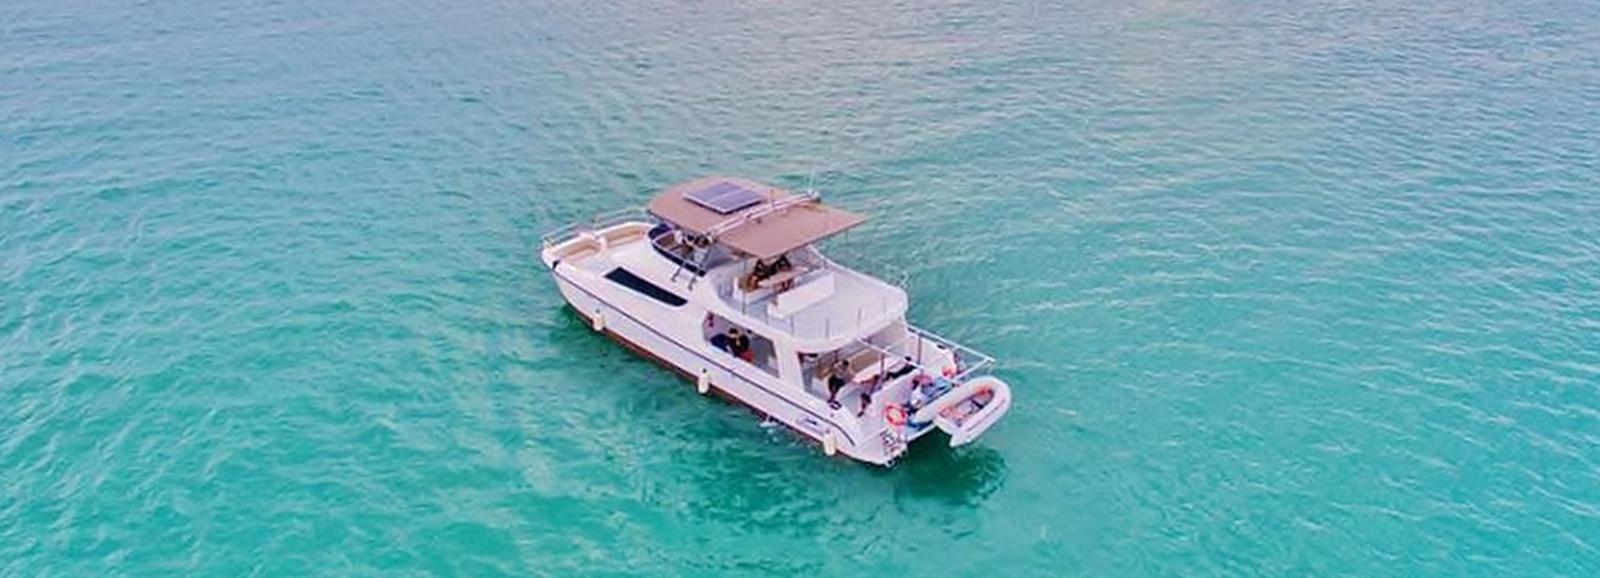 From Phuket: Phi Phi & Maiton Islands Day Trip by Catamaran